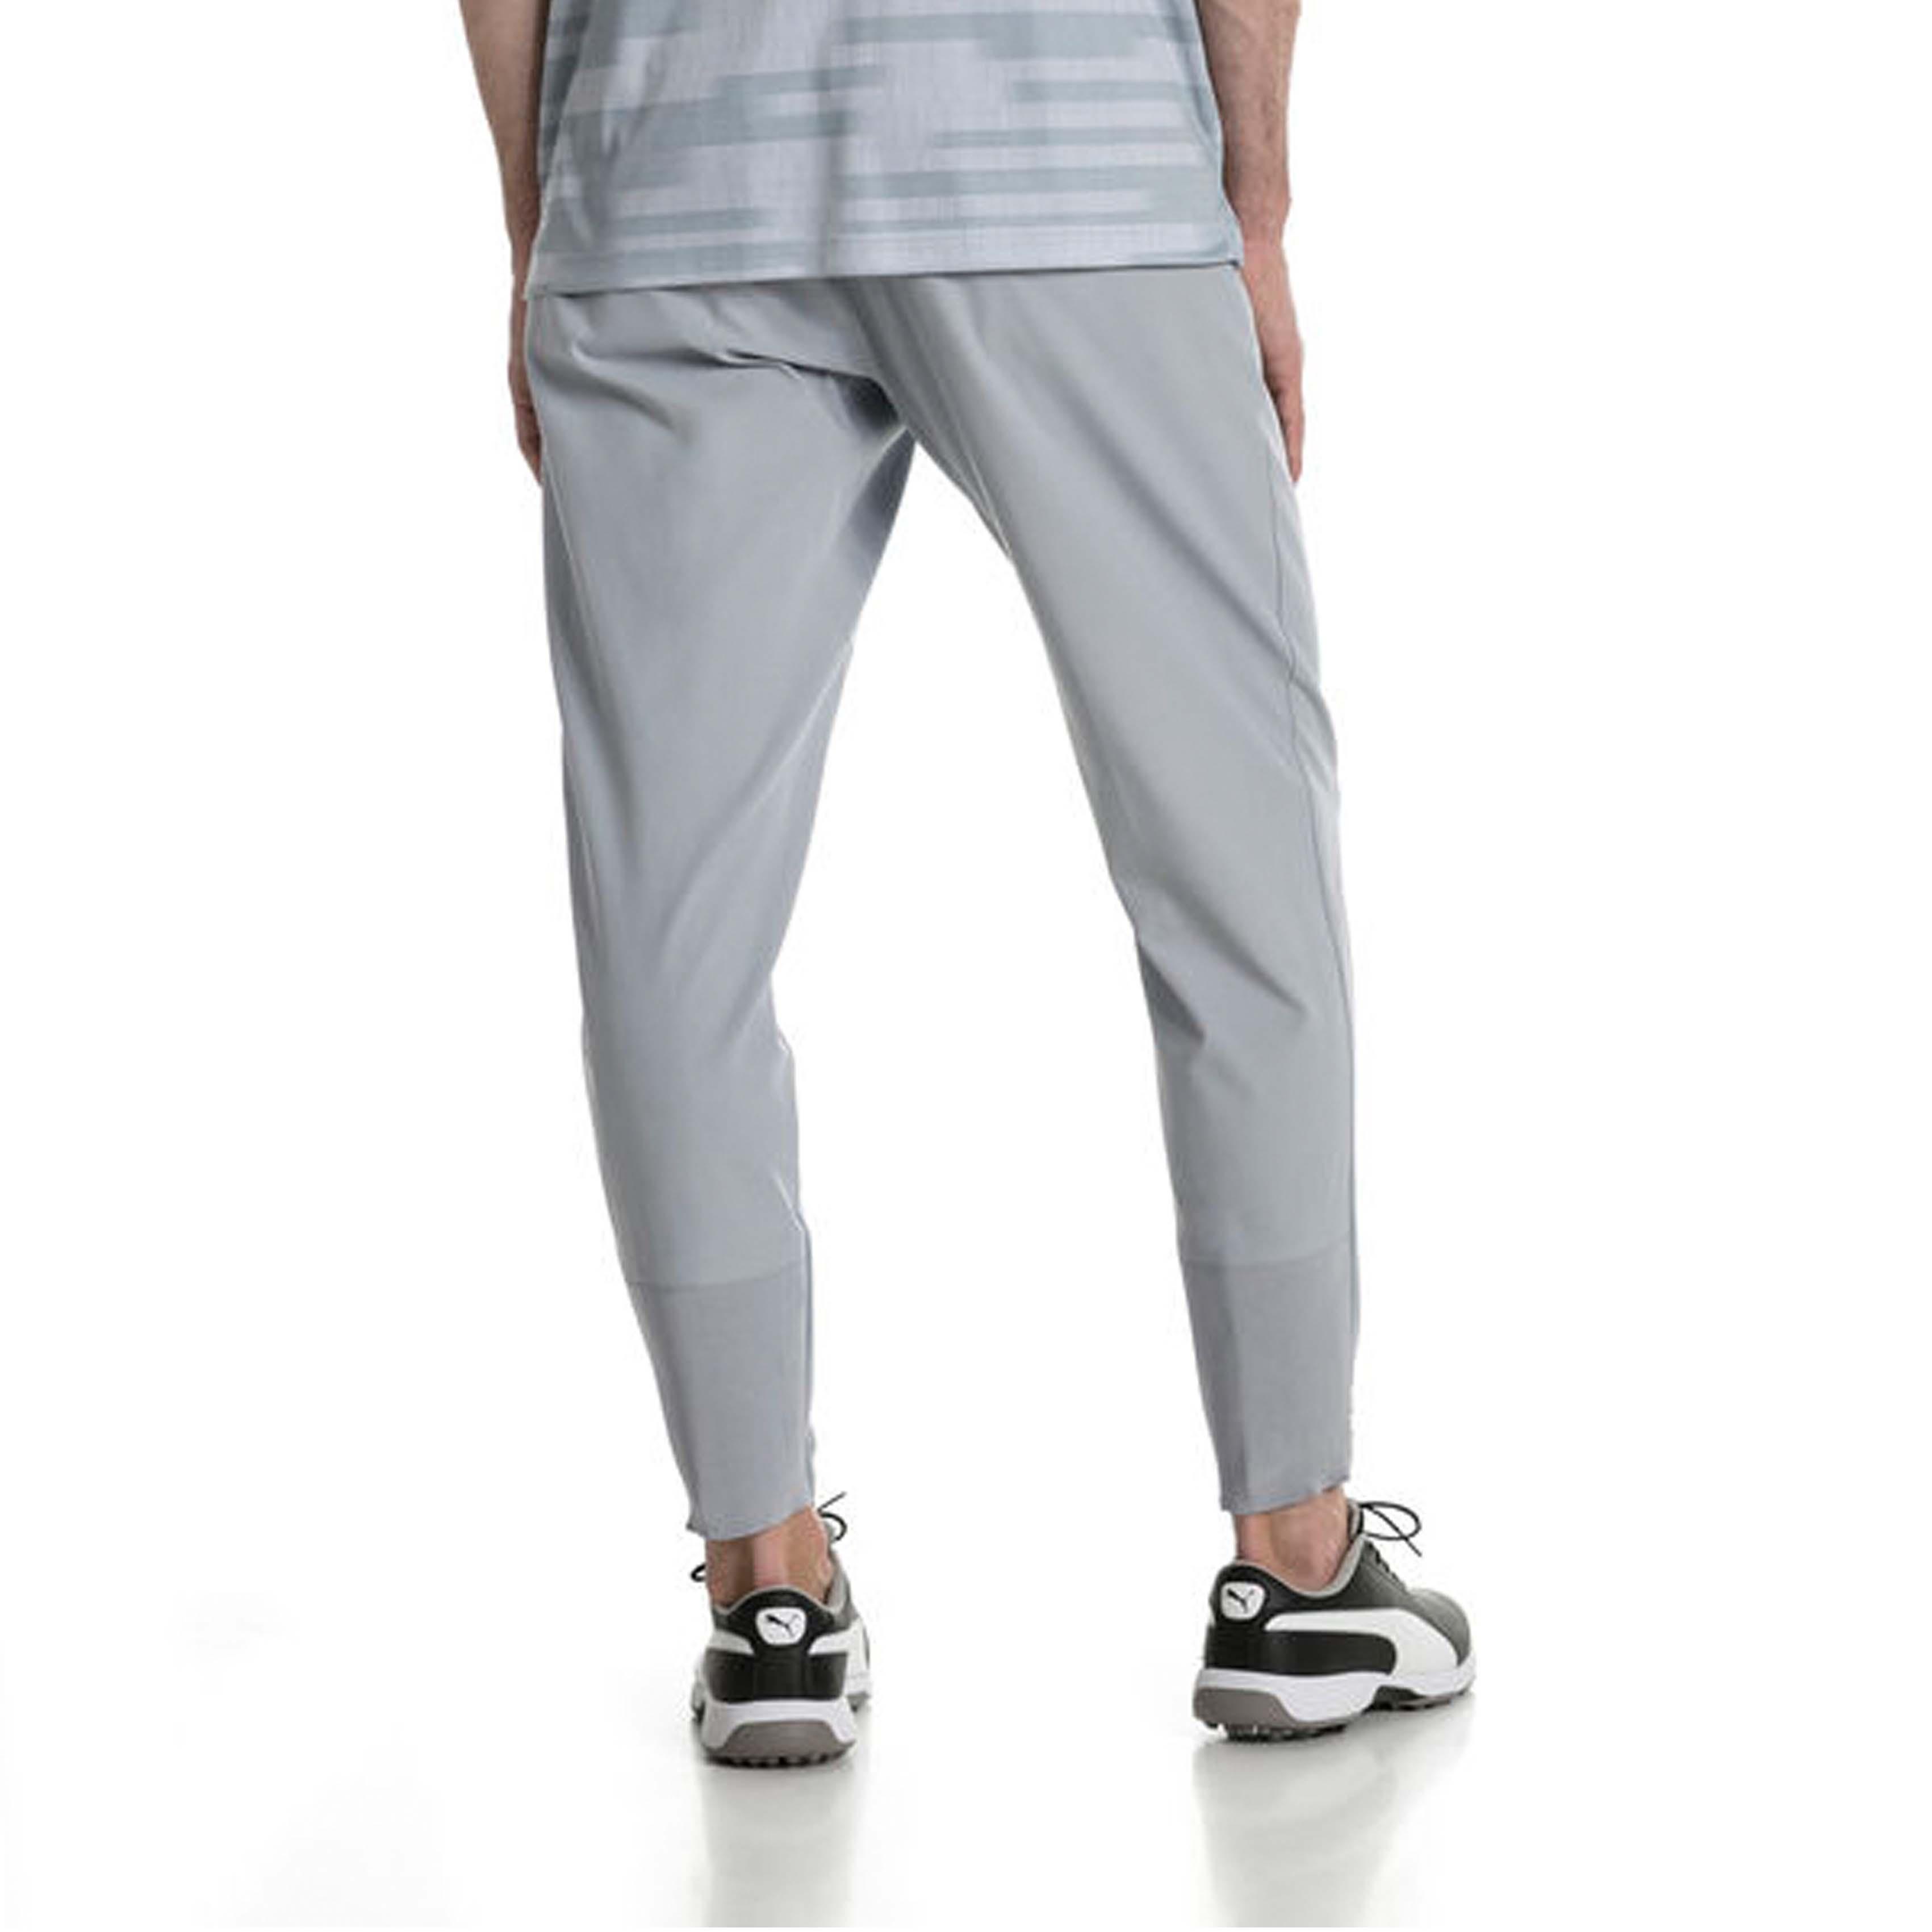 7b1747ef2296 Puma Golf Mens 2018 Golf Jogger Bottoms Cropped Trouser Pants 32